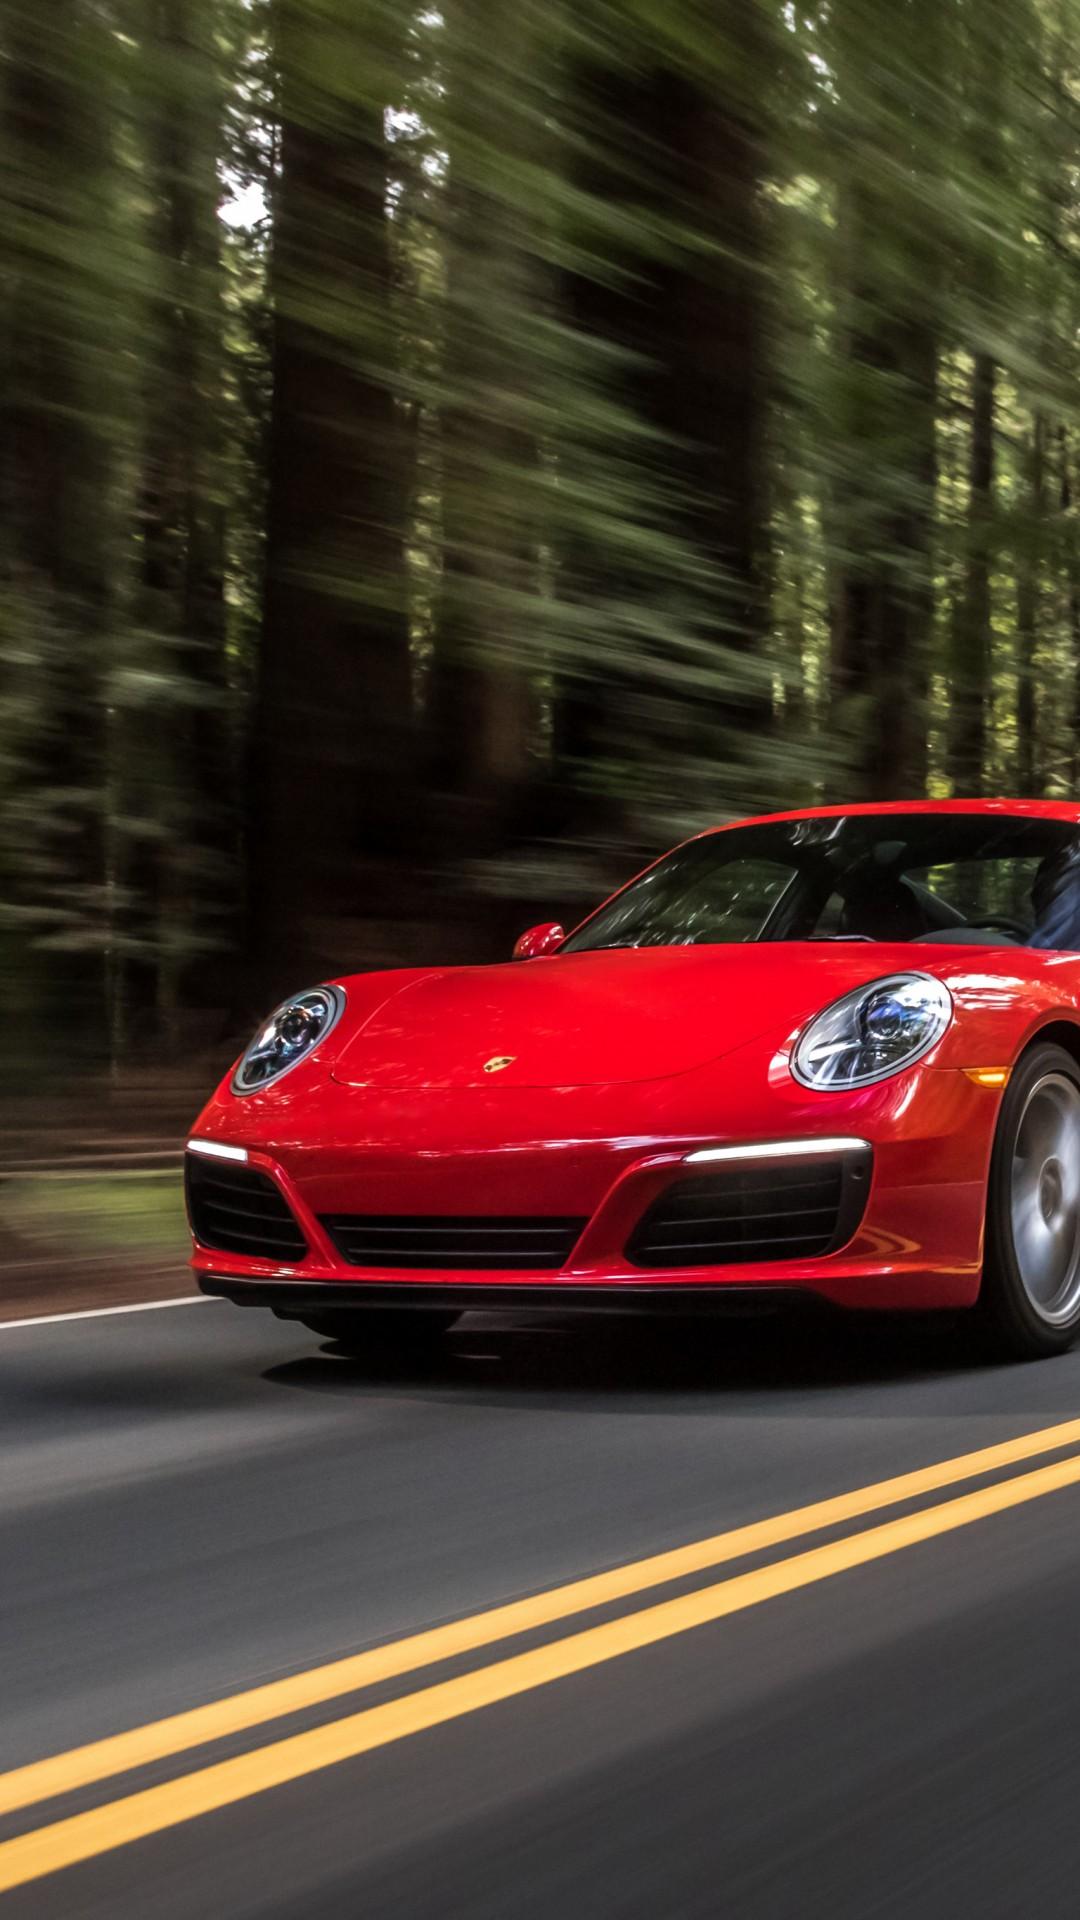 Wallpaper porsche 911 carrera 4s coupe red cars bikes - Porsche 911 carrera s wallpaper ...